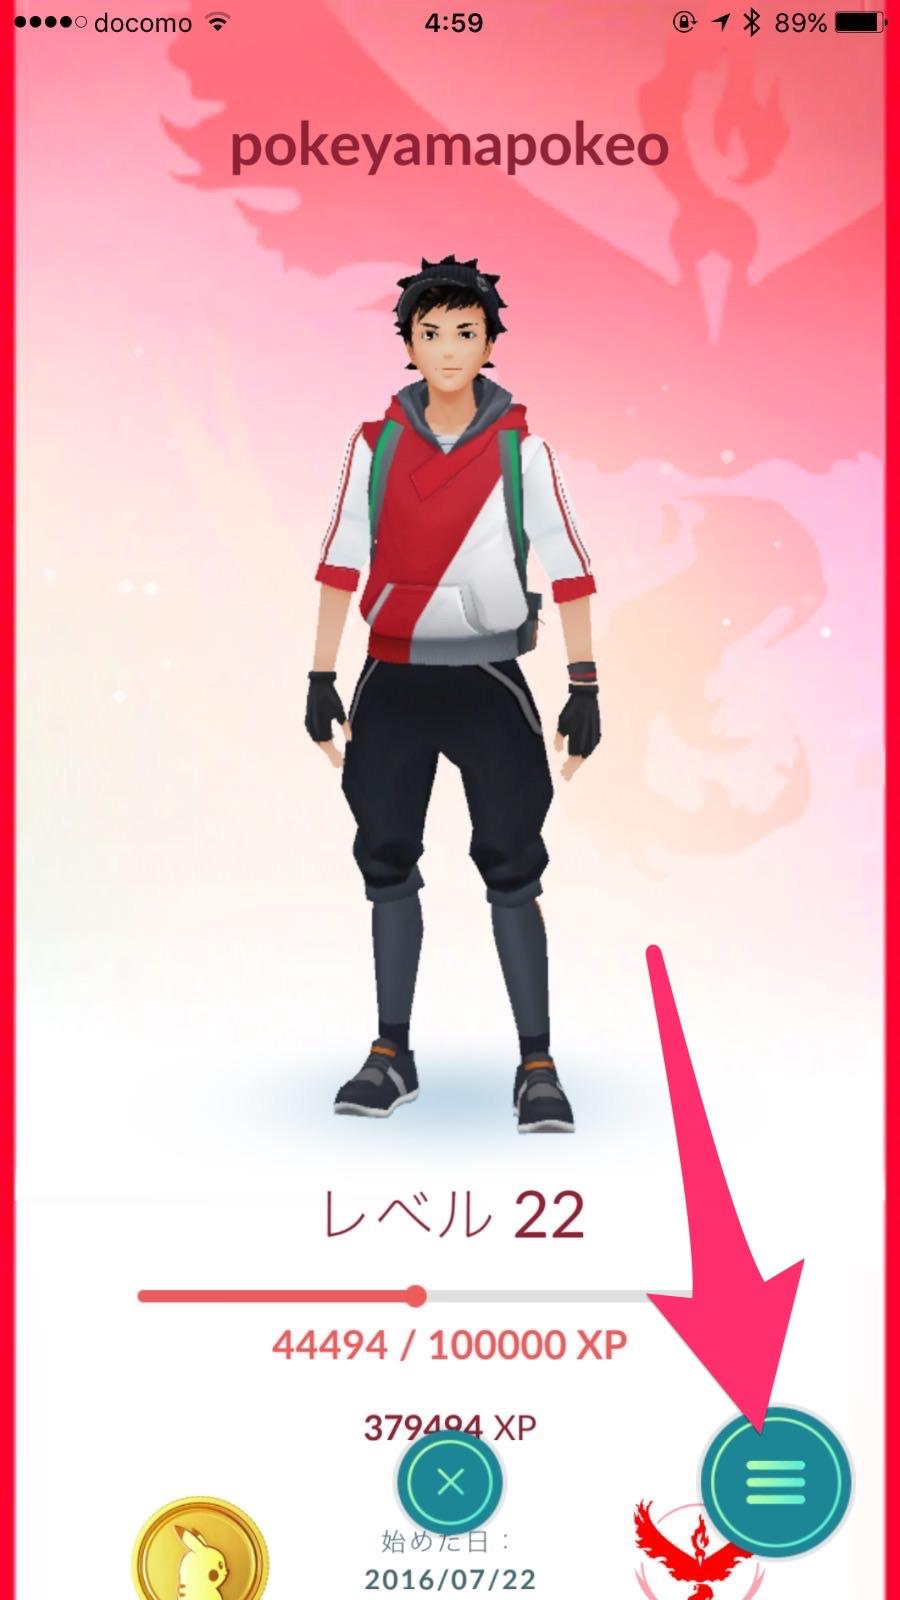 Pokemon go buddy 8430